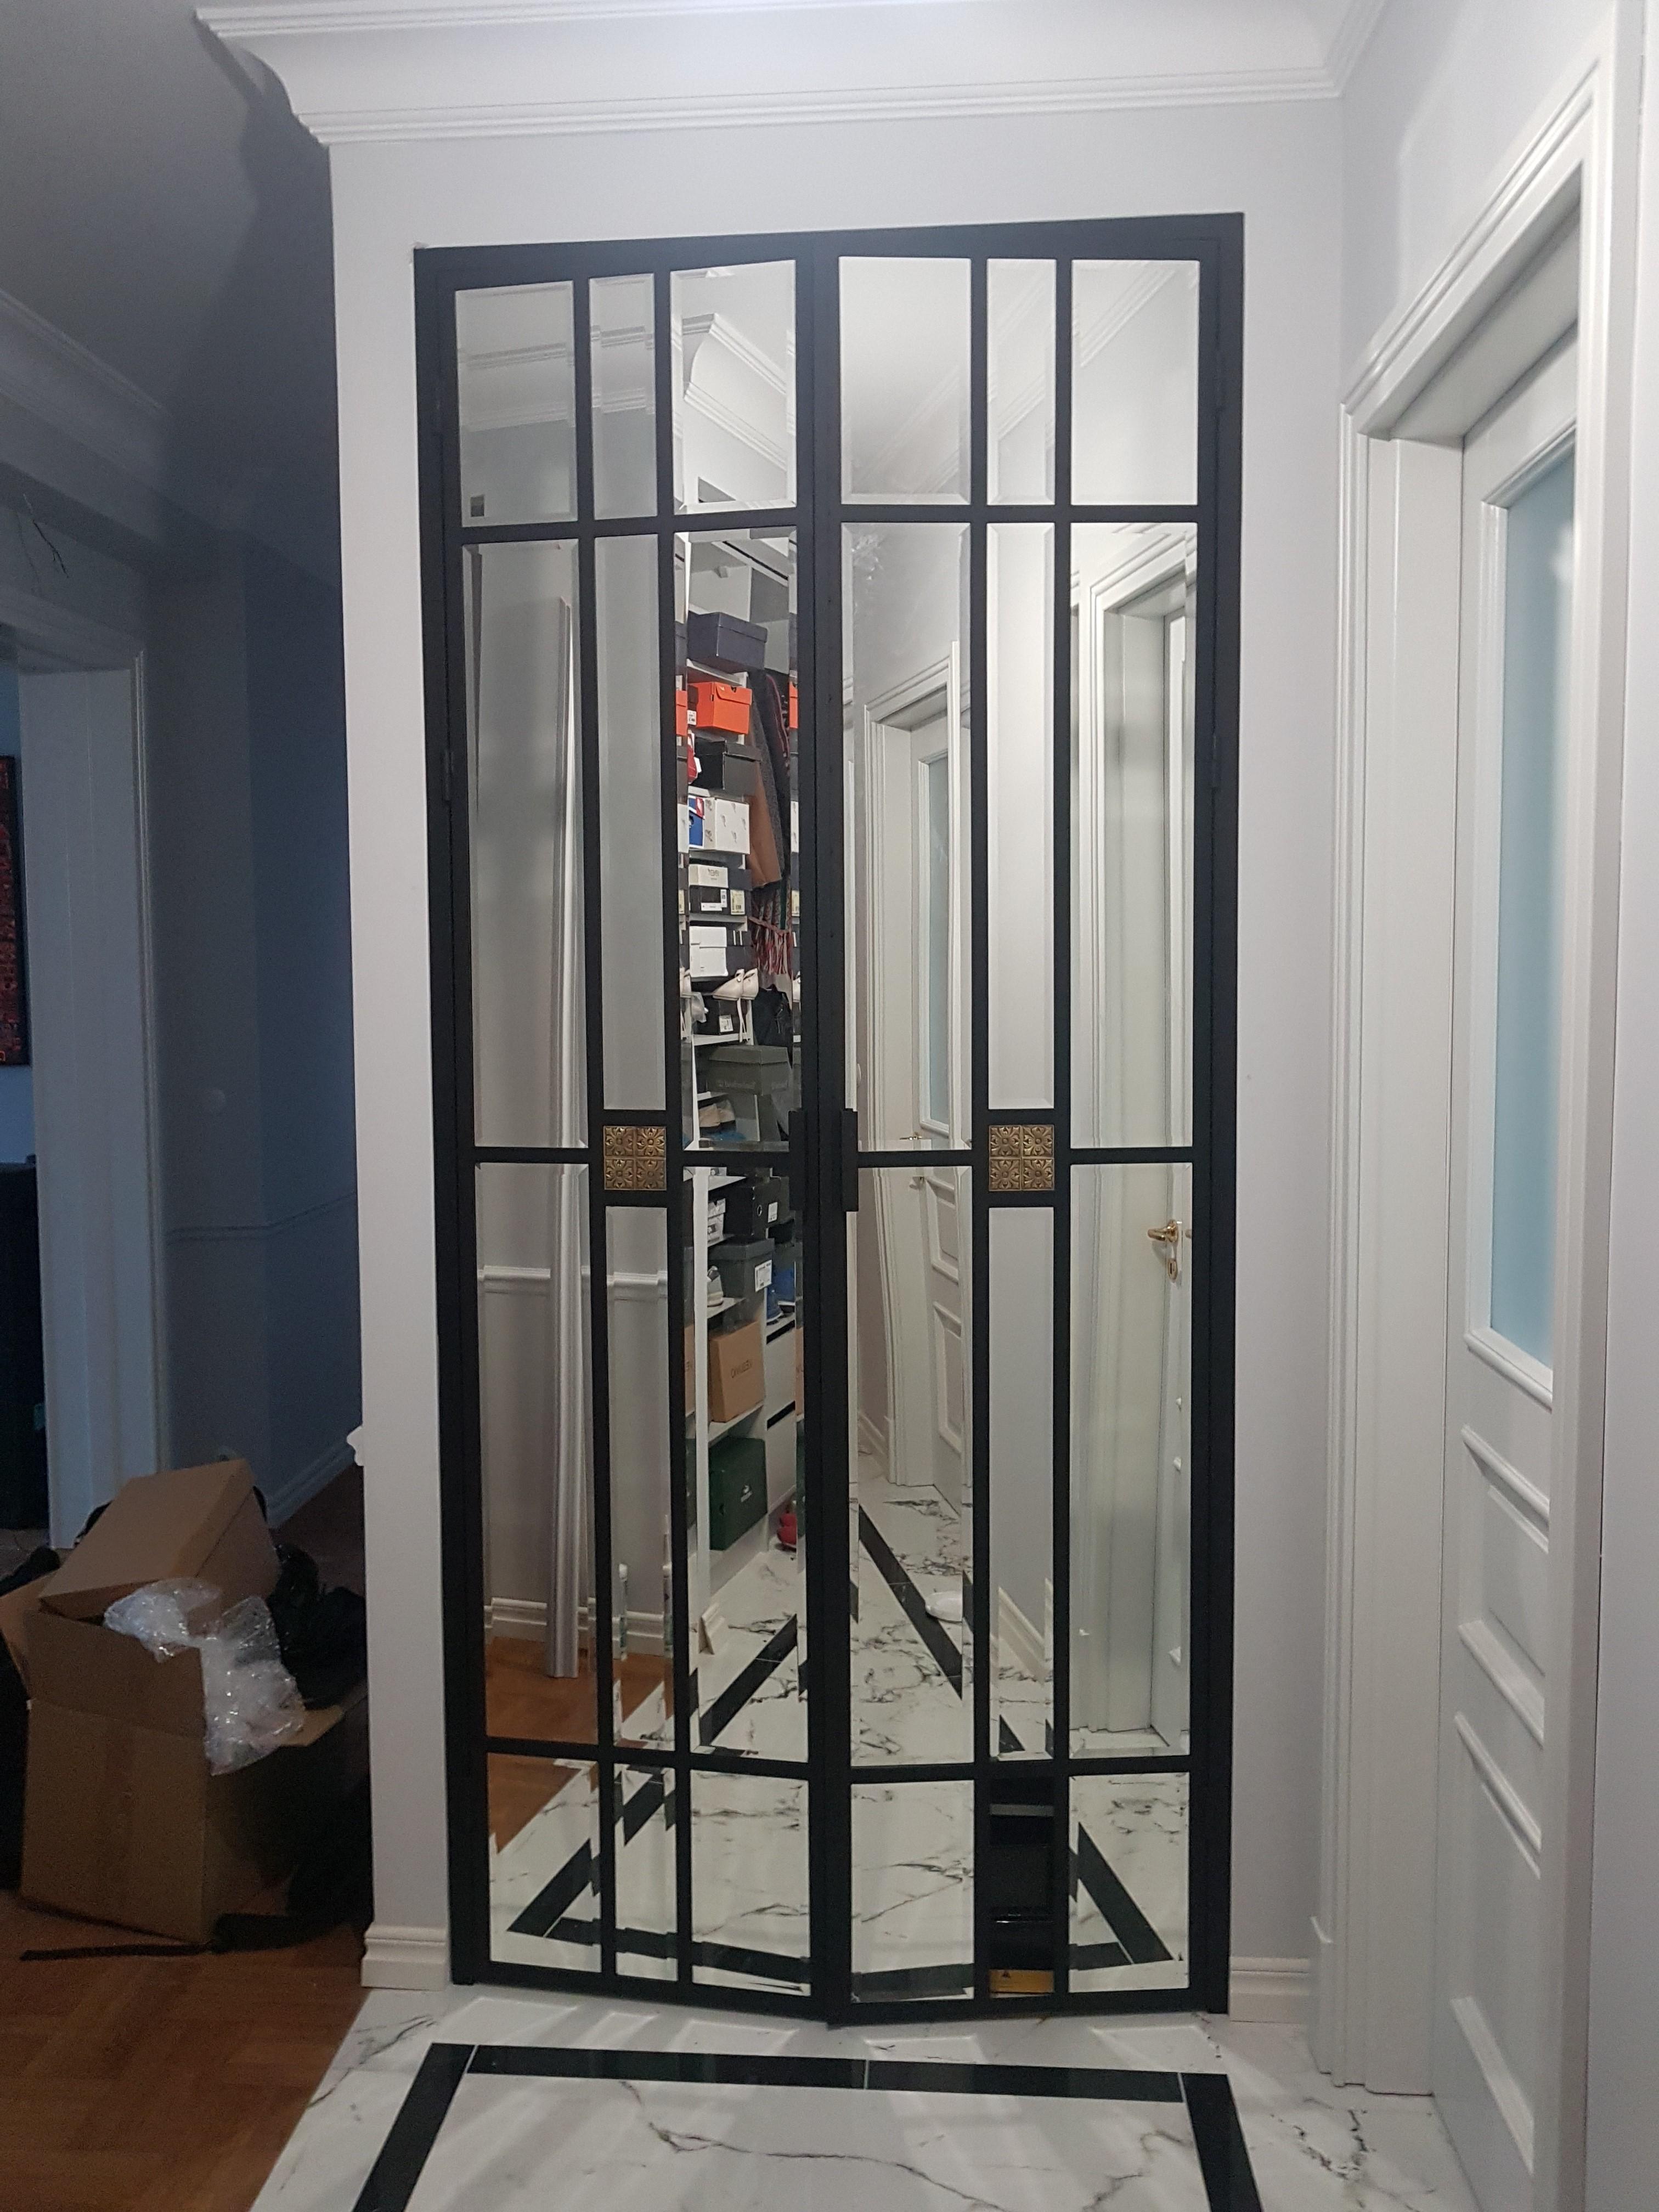 gdel drzwi do szafy z lustrem